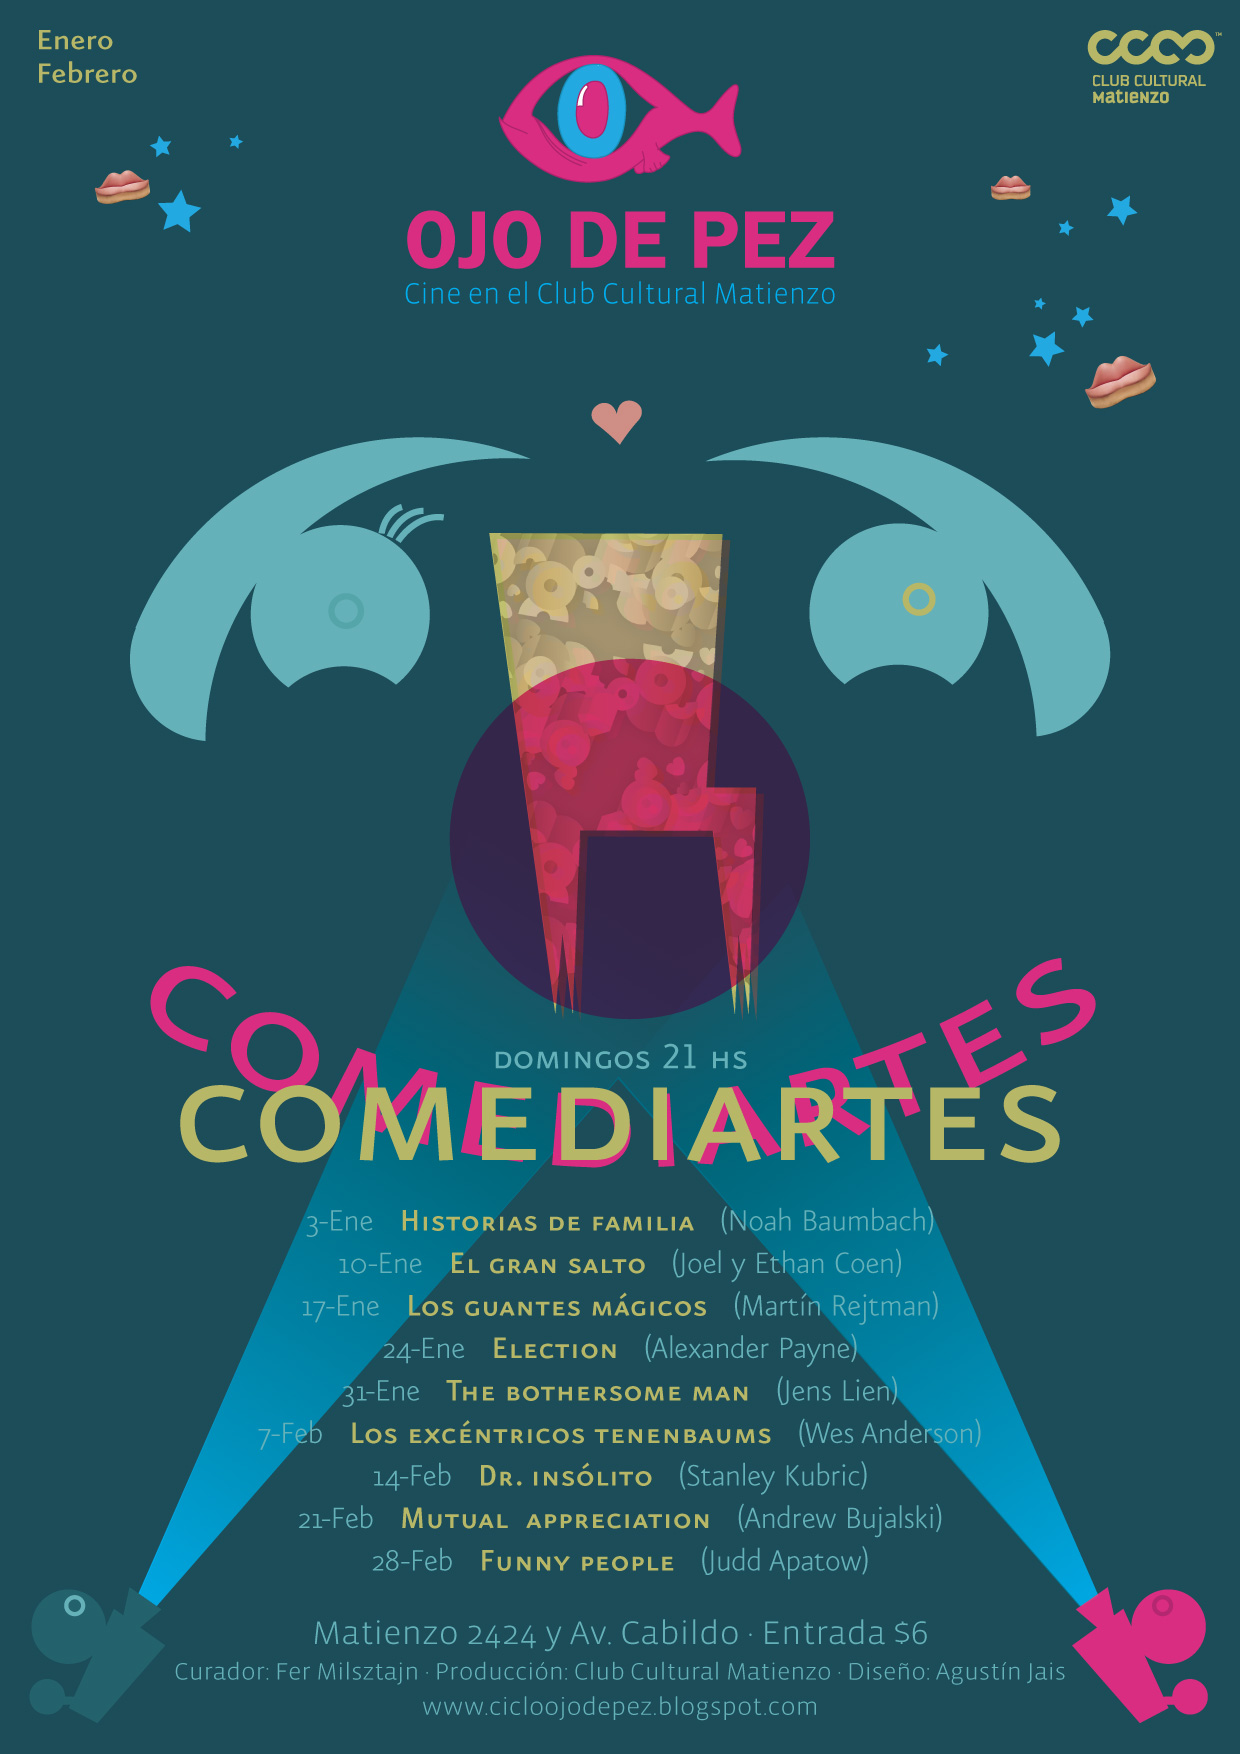 http://clubculturalmatienzo.files.wordpress.com/2009/12/ojo-de-pez-afiche-comediartes.jpg